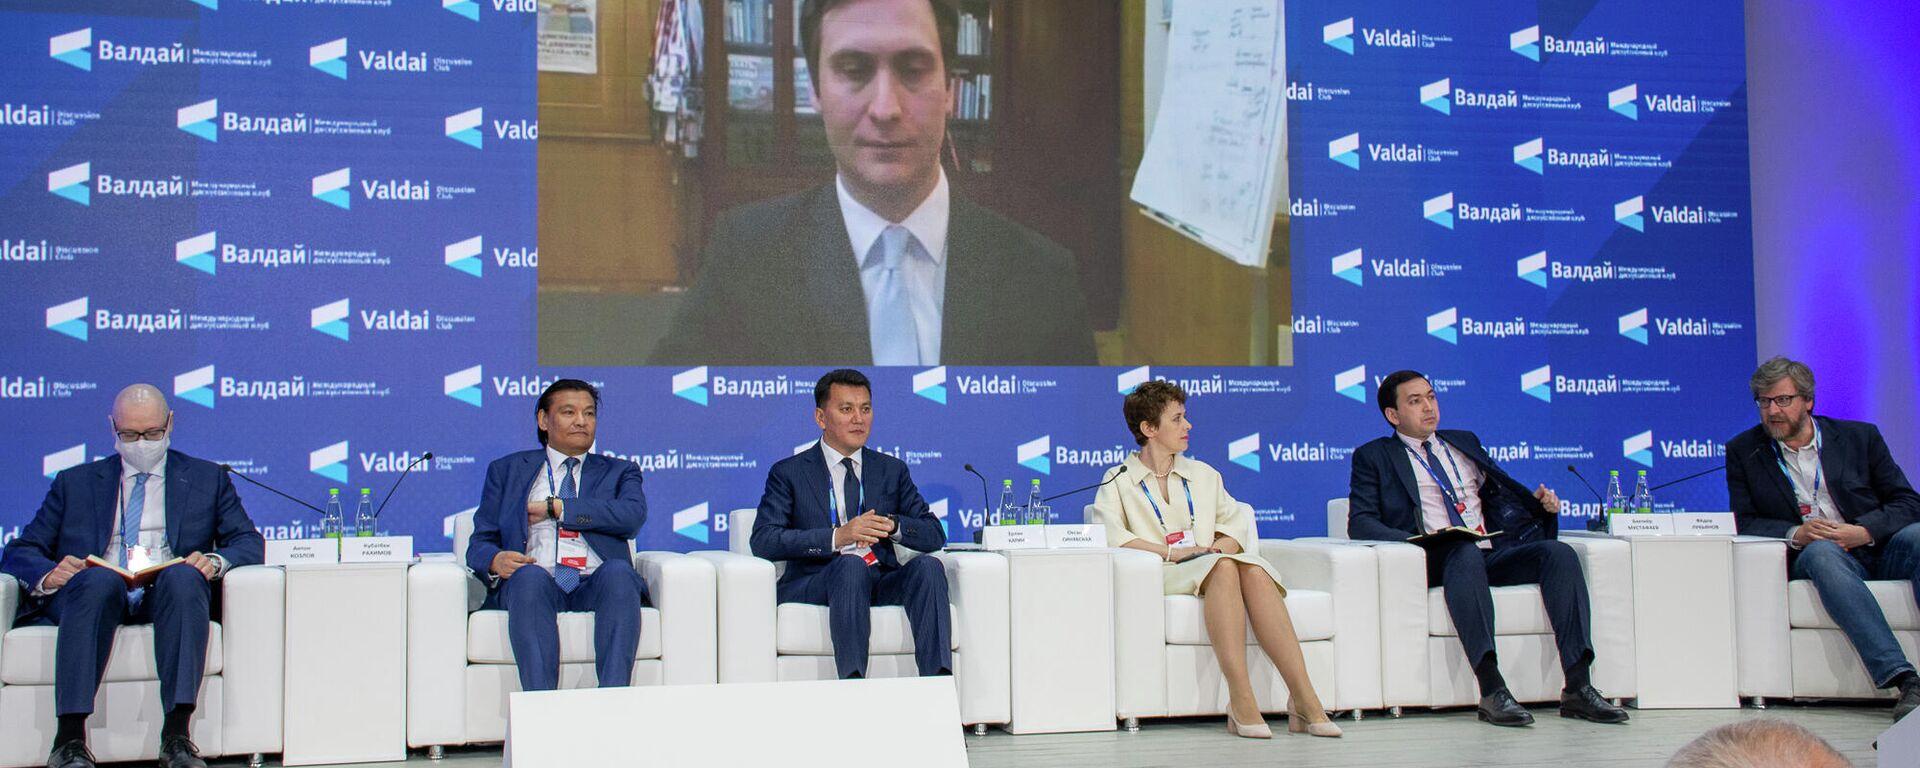 Центральноазиатская конференция клуба Валдай - Sputnik Узбекистан, 1920, 20.05.2021